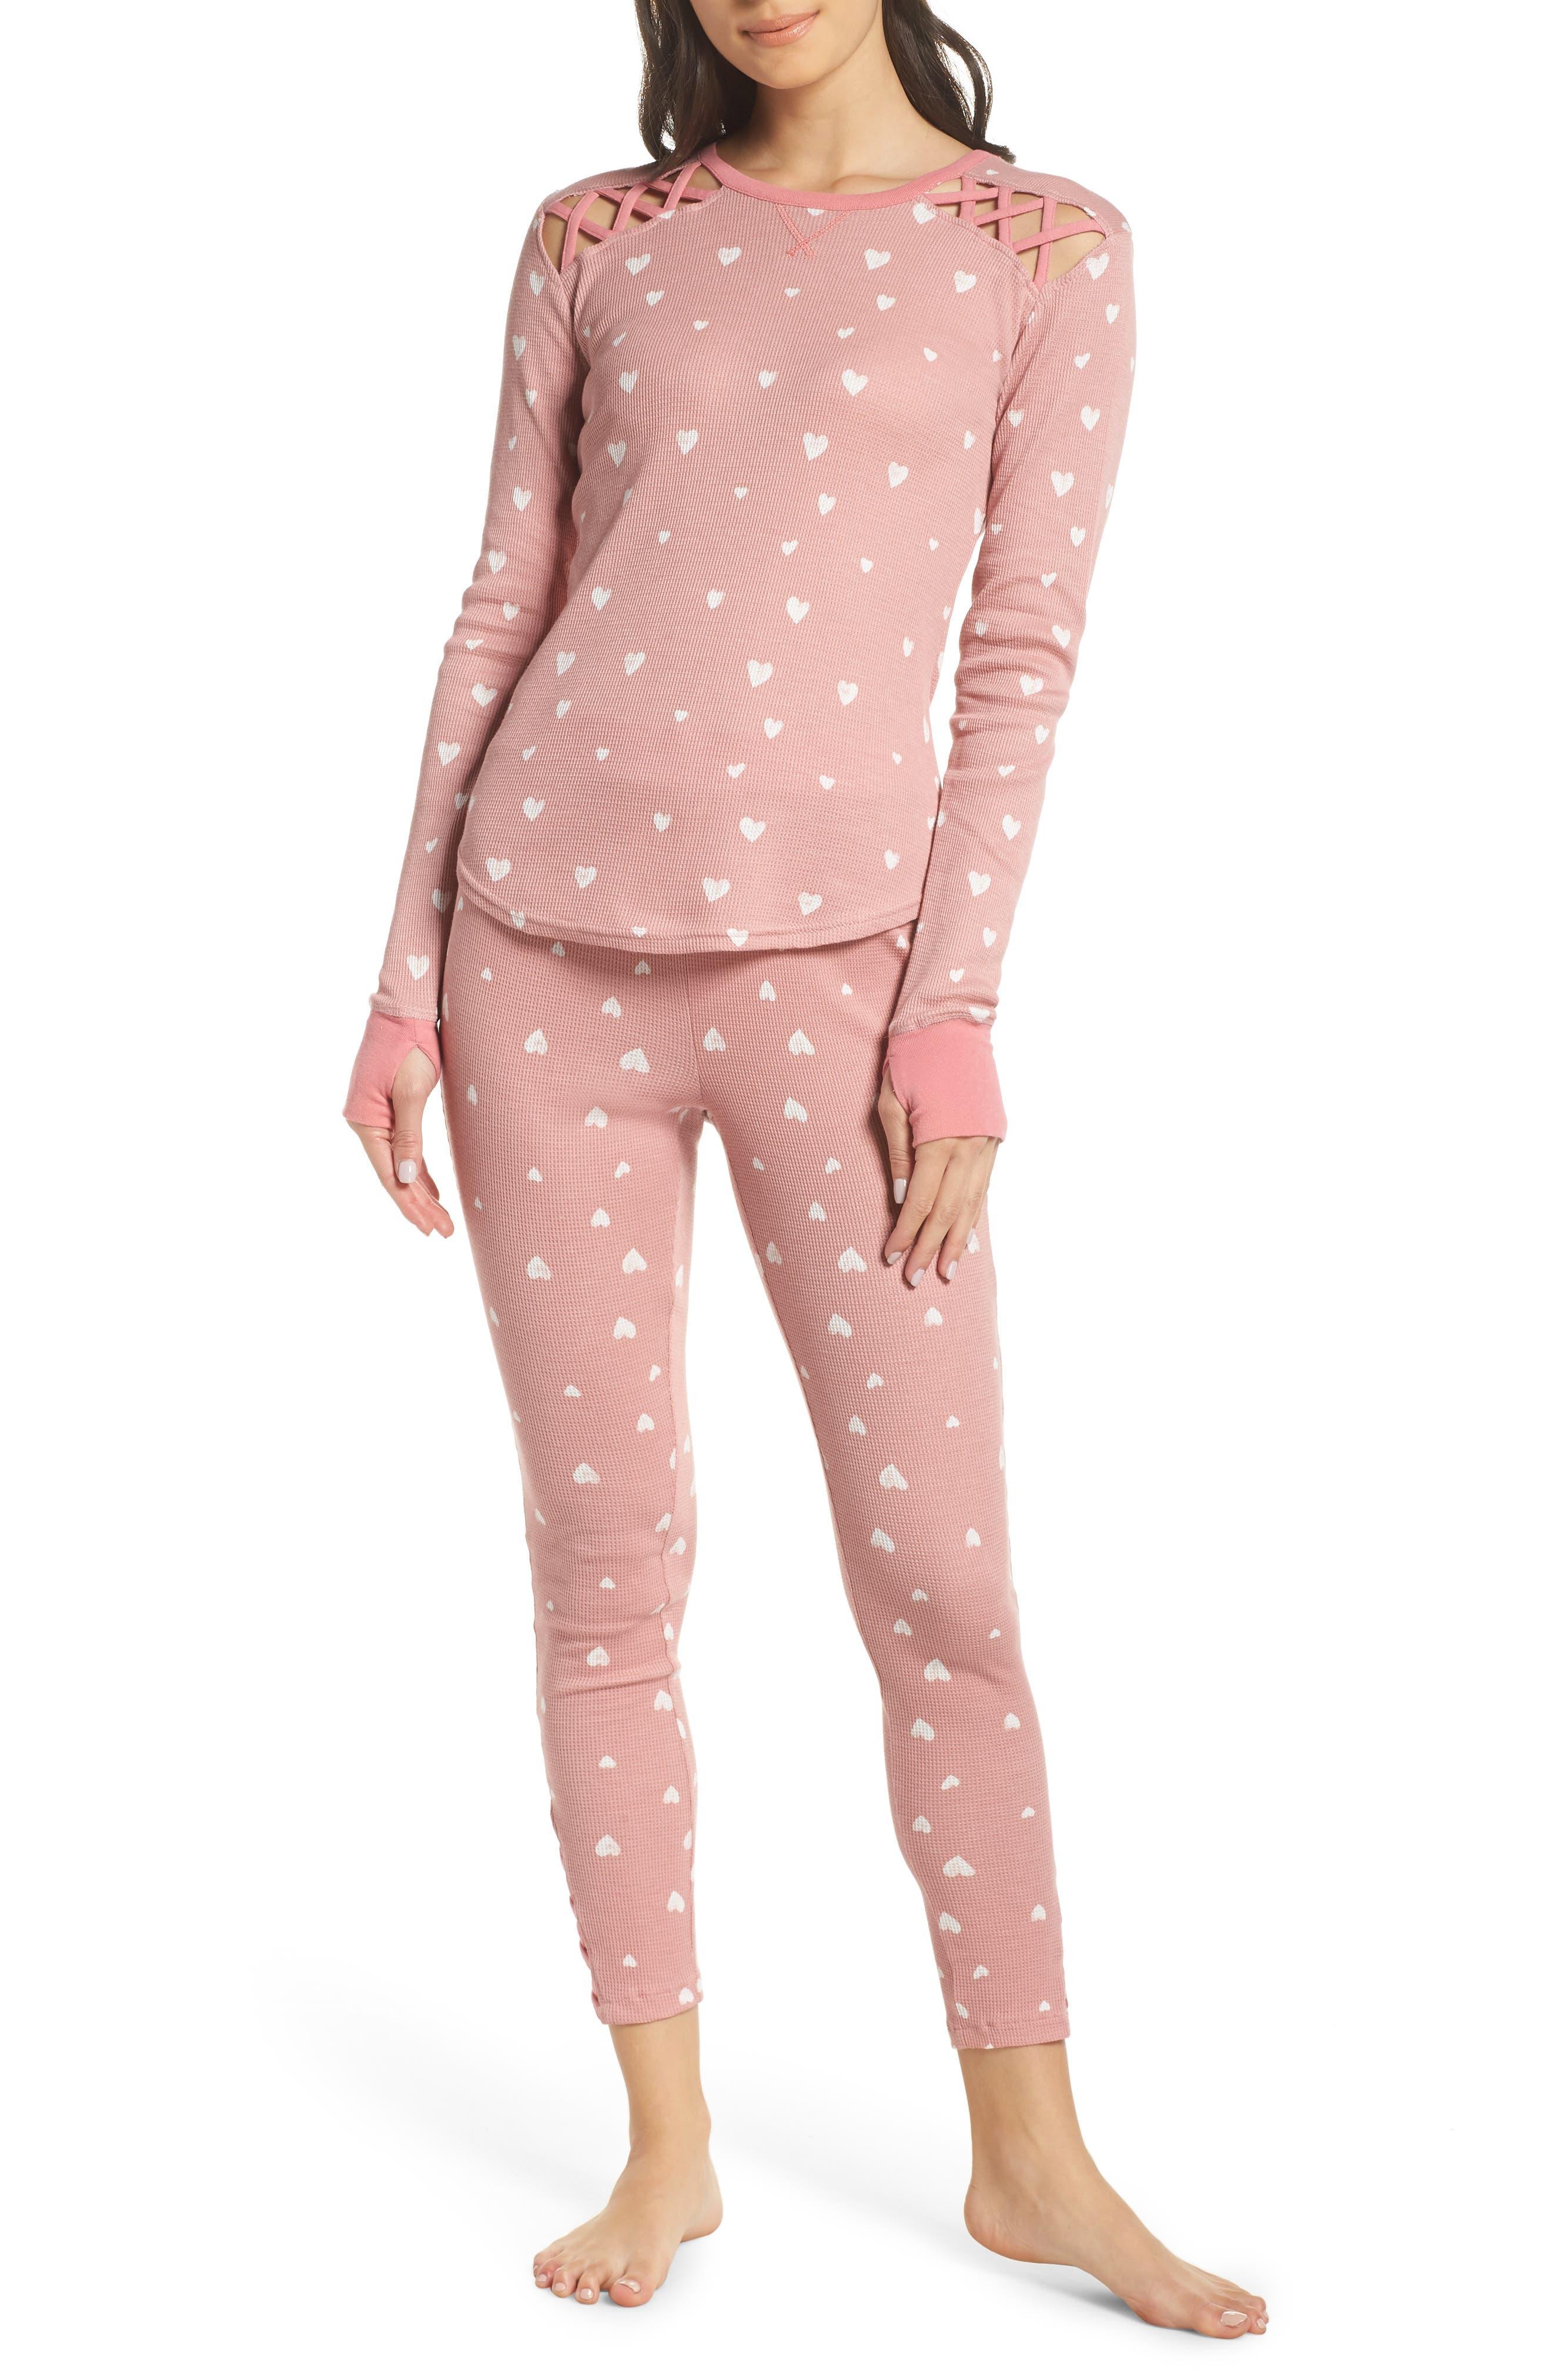 RETROSPECTIVE CO., Thermal Pajamas, Main thumbnail 1, color, 650